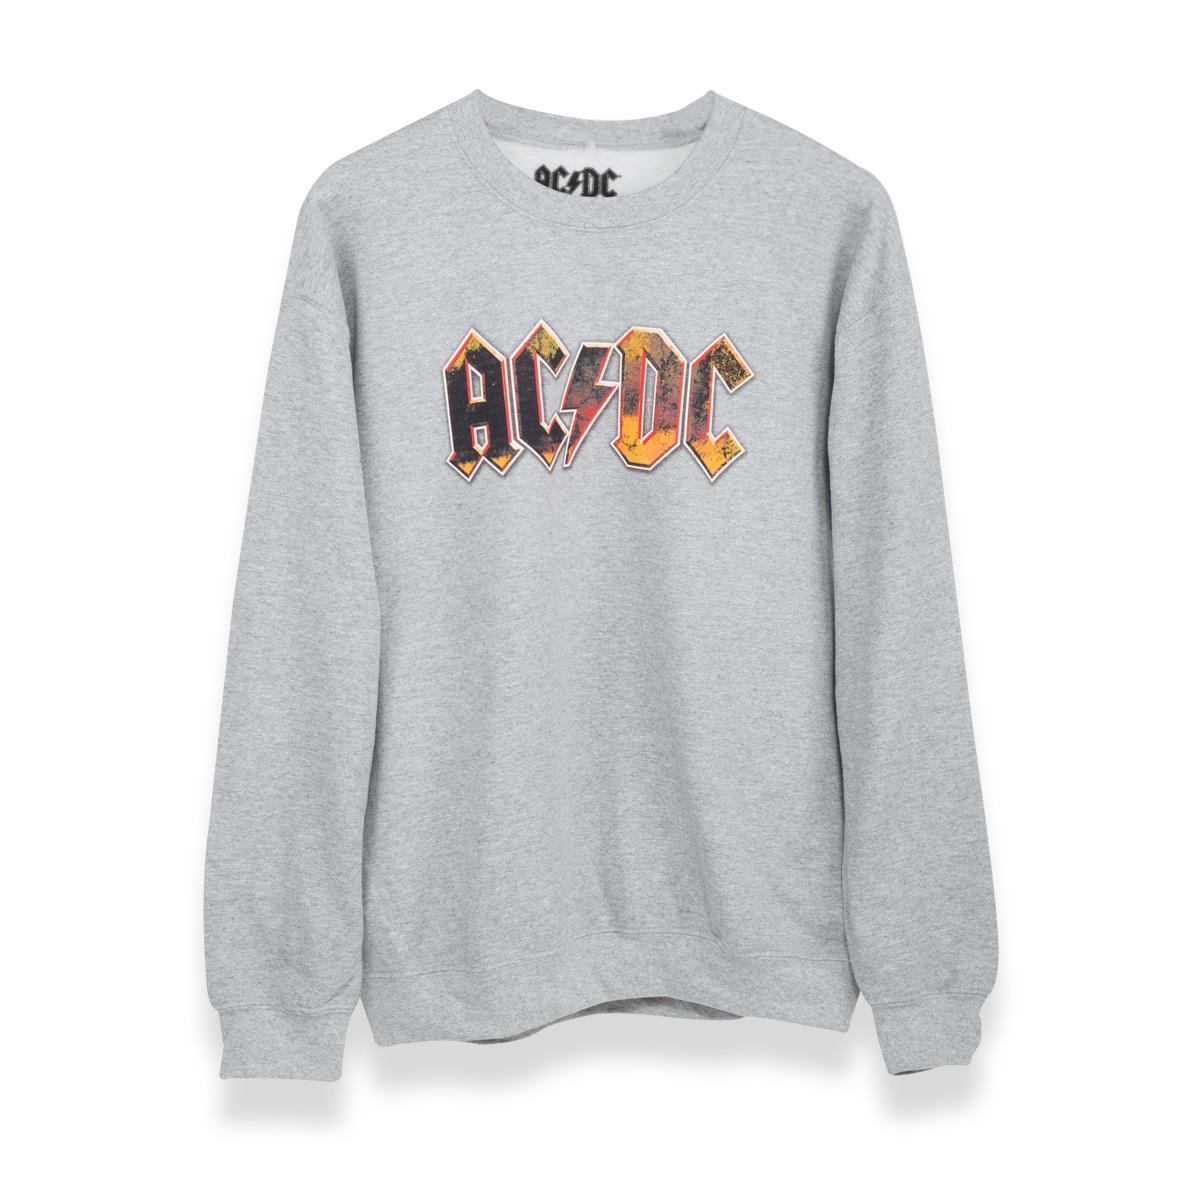 AC/DC Logo Crewneck Sweatshirt - Grey